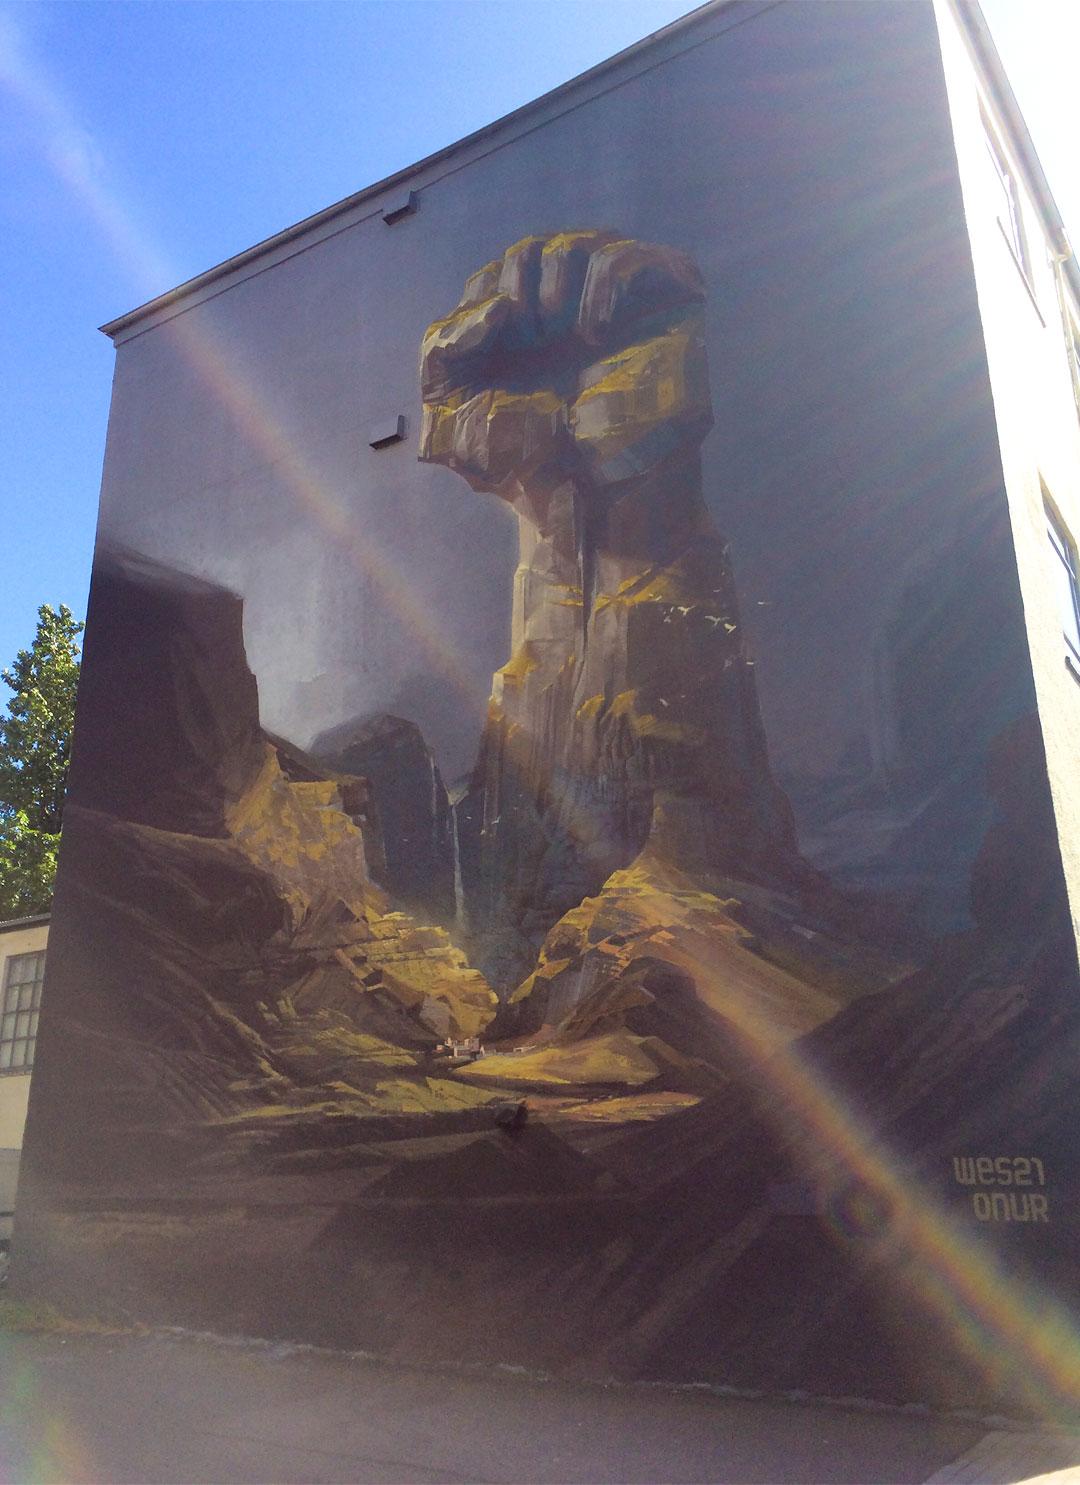 Awesome mural in Reykjavik